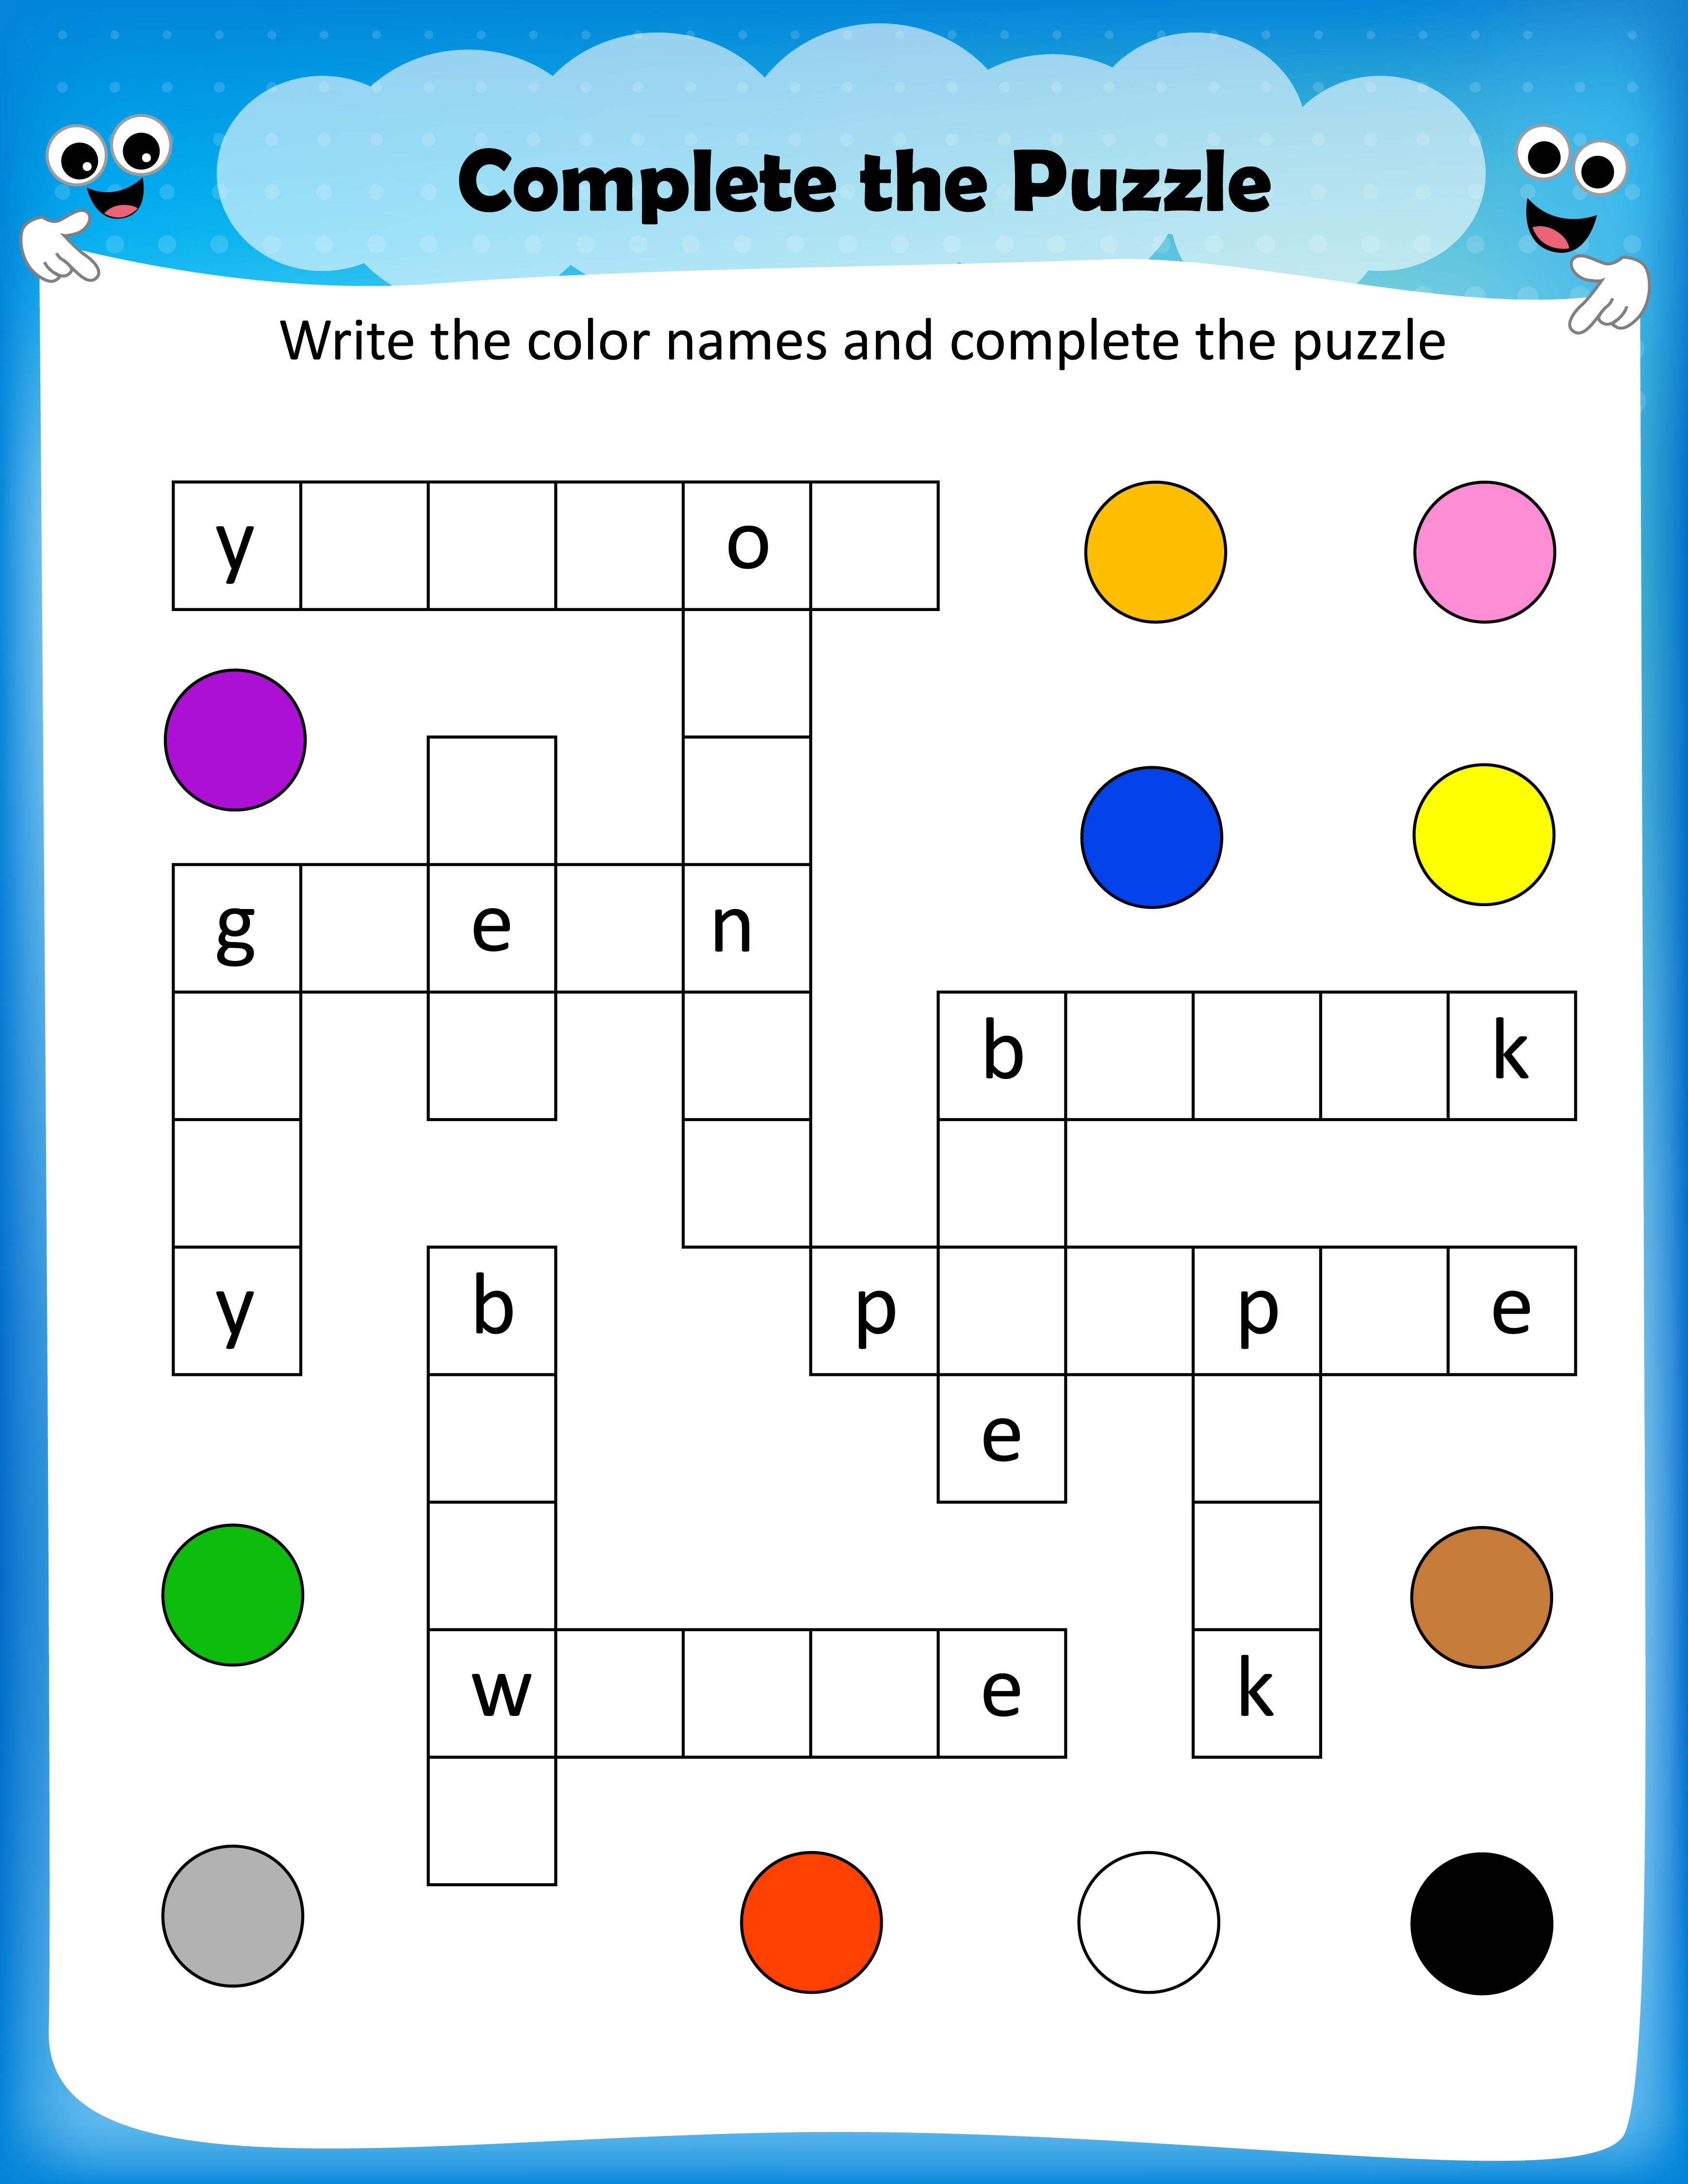 Free Printable Crosswords With Top 10 Benefits For Our Kids - Free Printable Crossword Puzzles For Kids